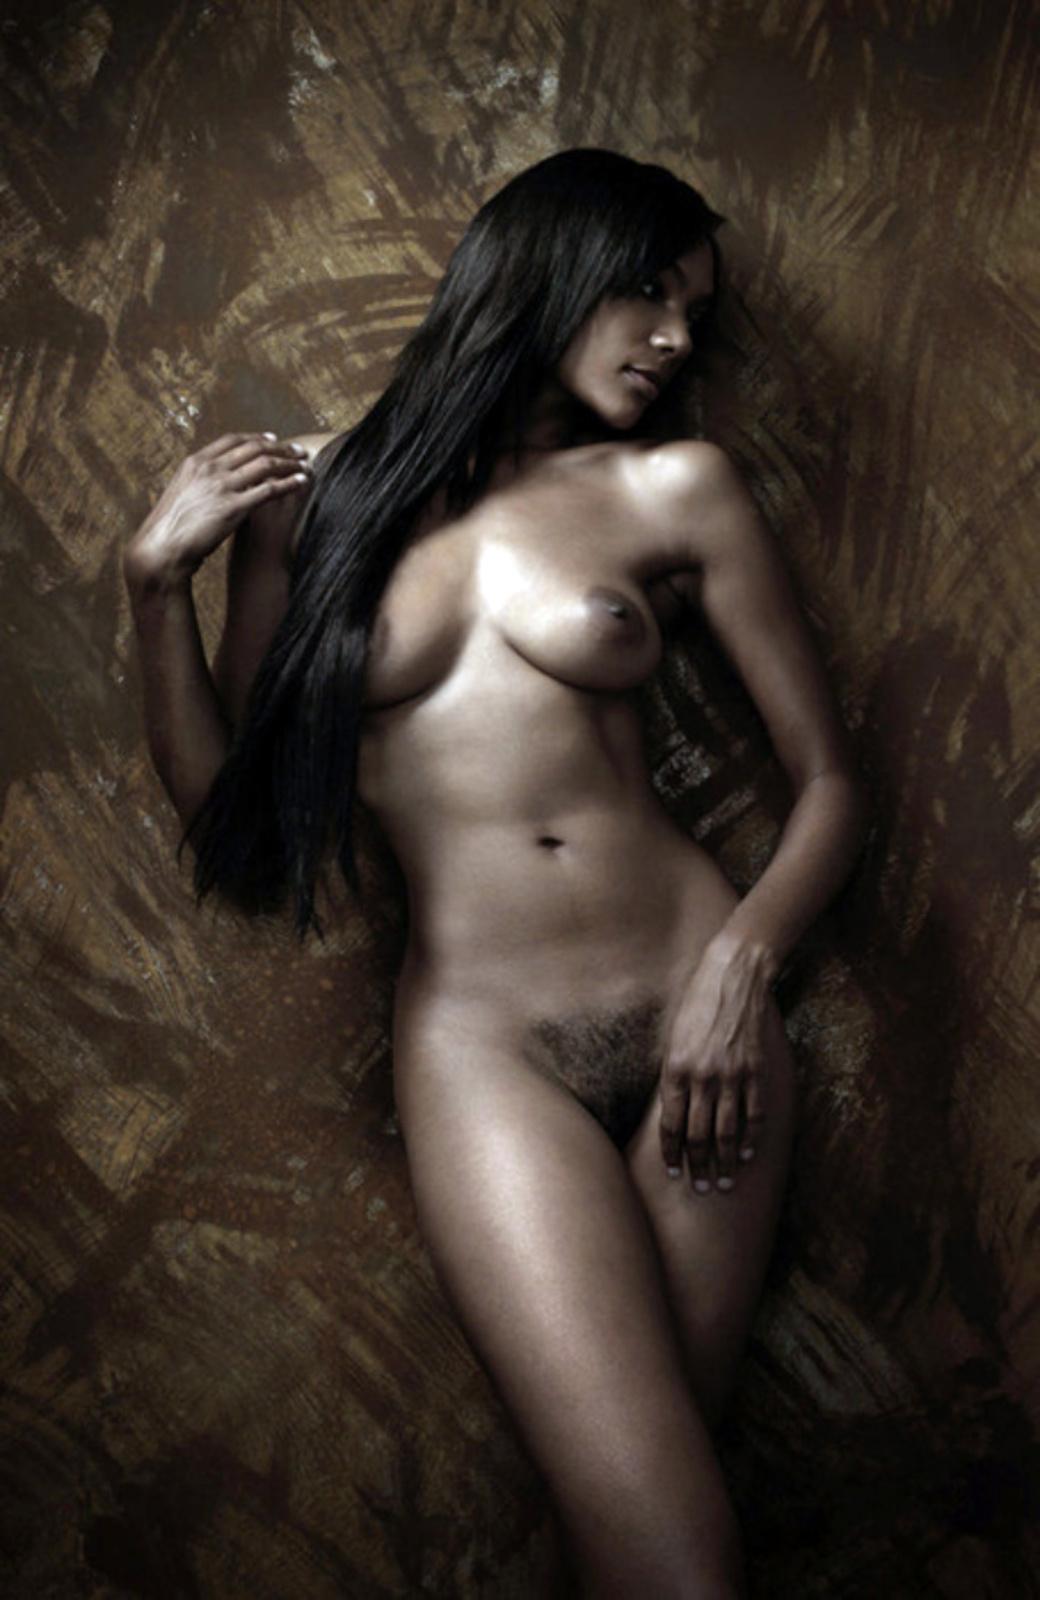 dark pic art nude jpg 1152x768